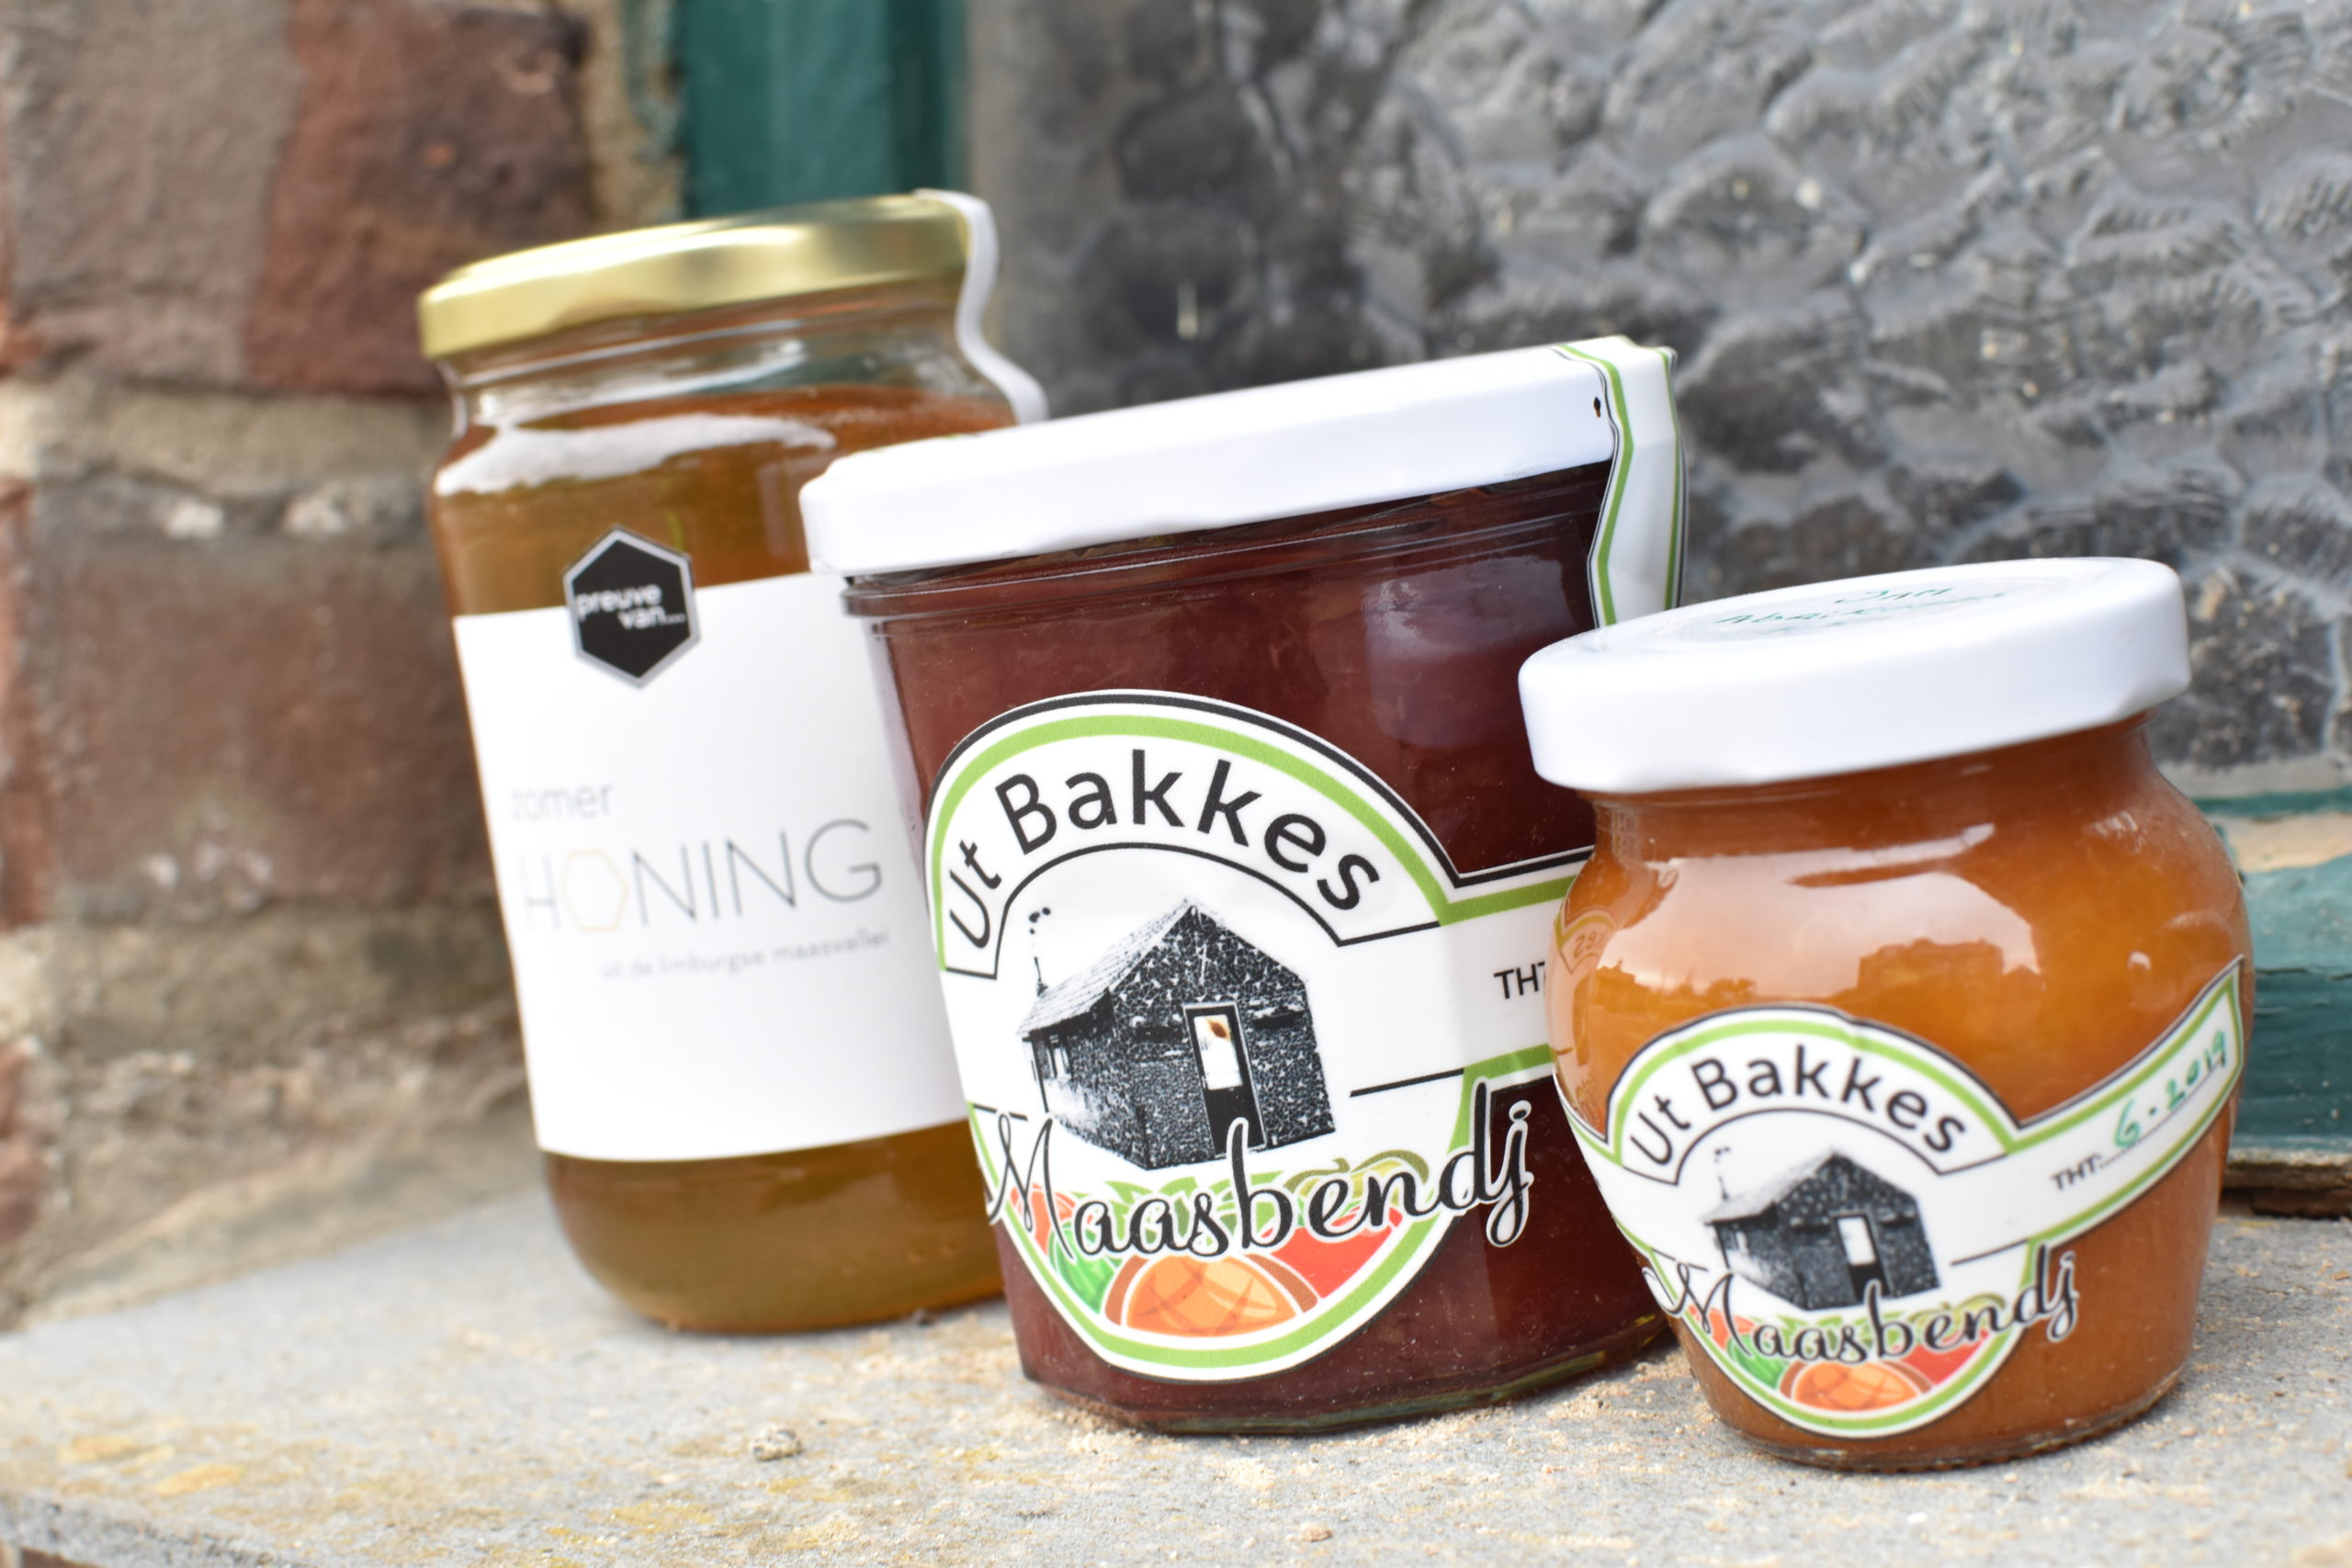 Ut Bakkes Maasband streekproducten jam en honing